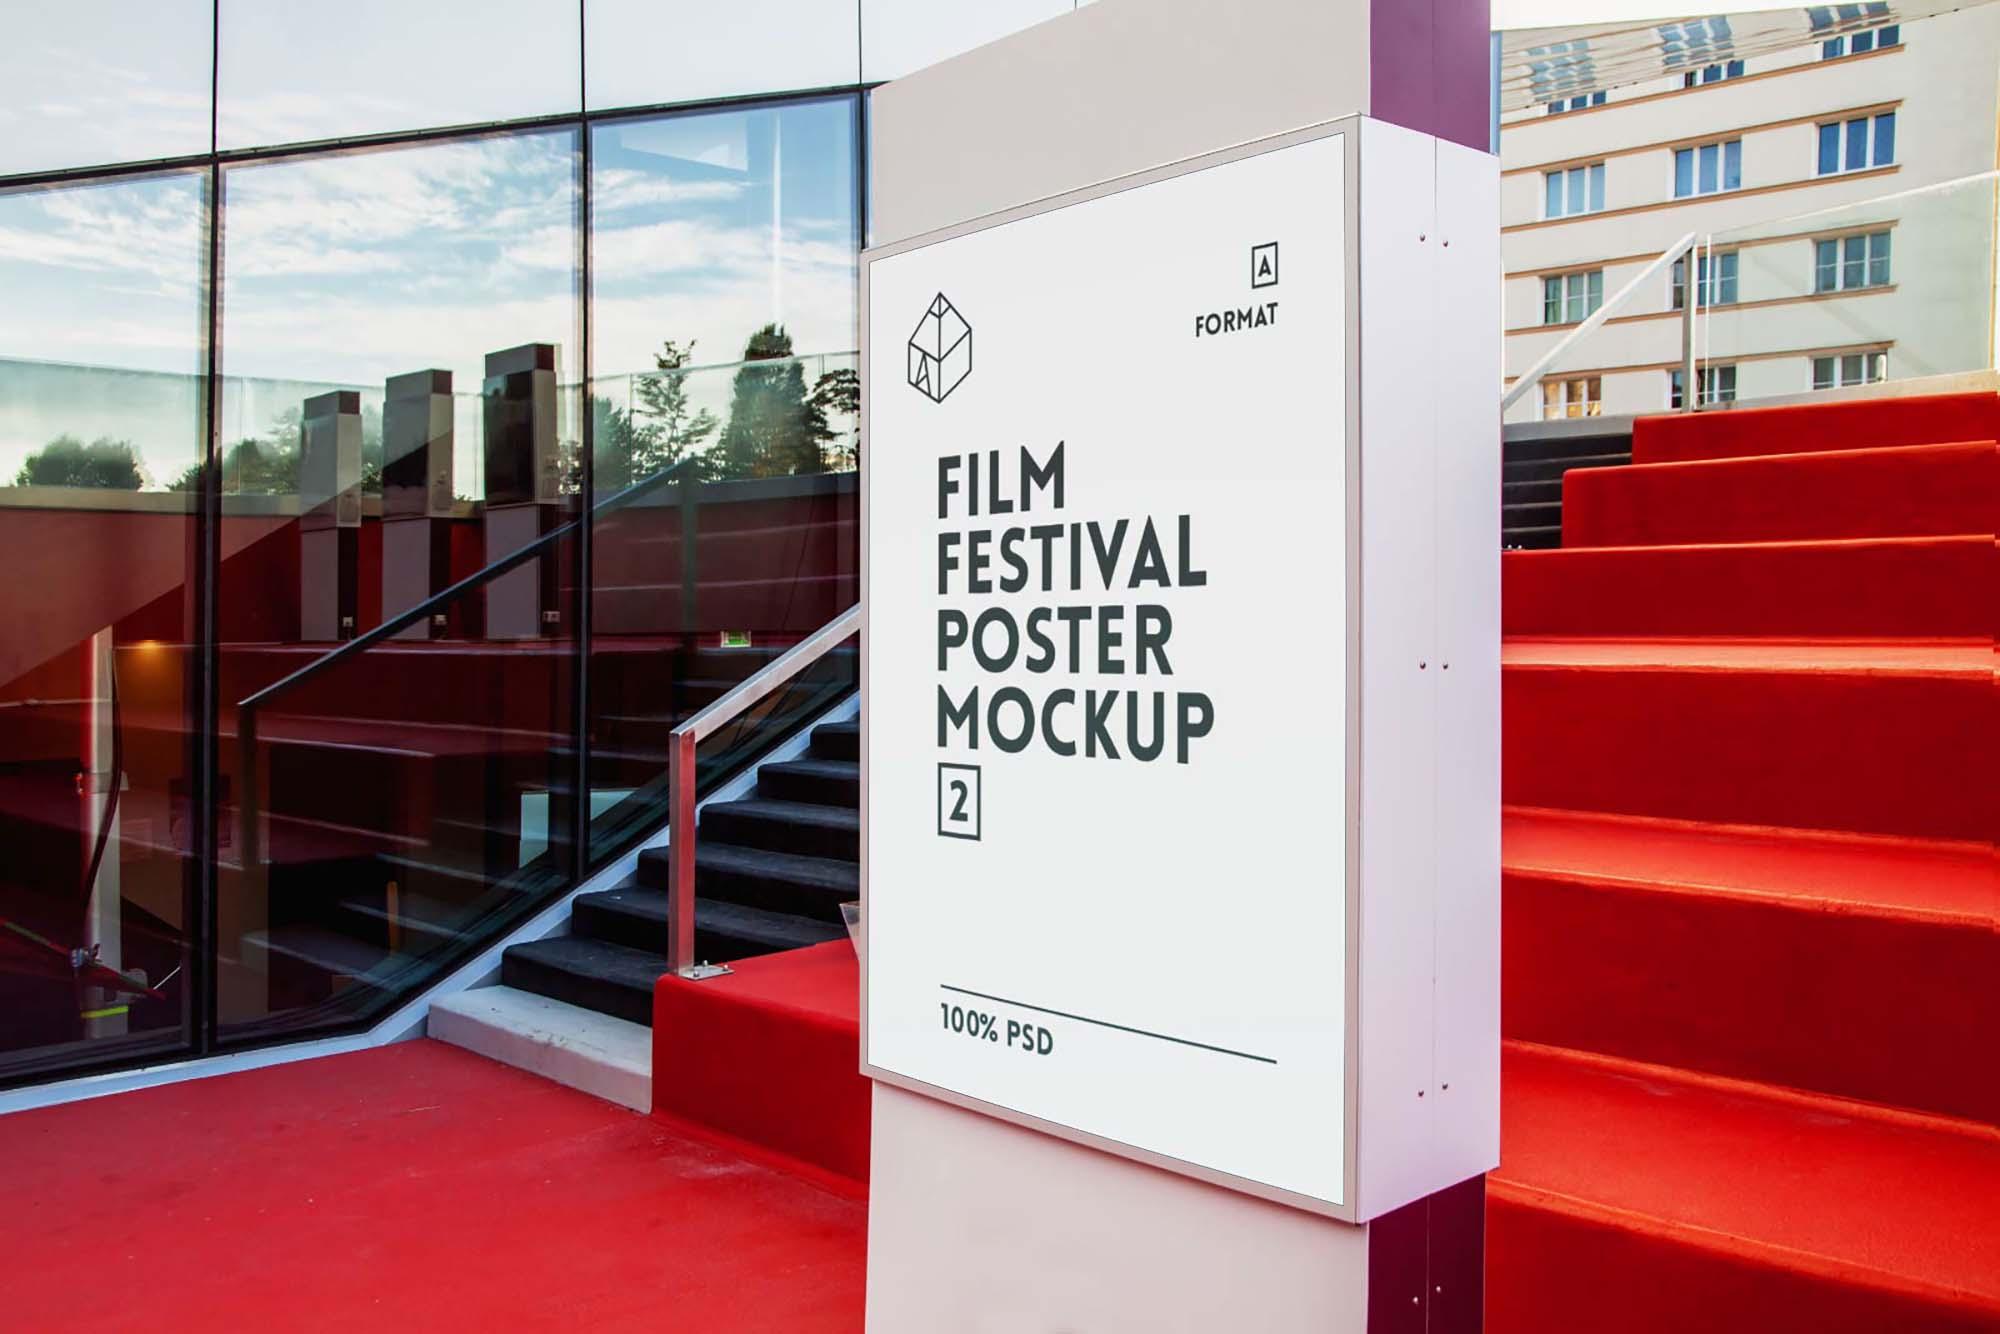 Film Festival Poster Mockup 1